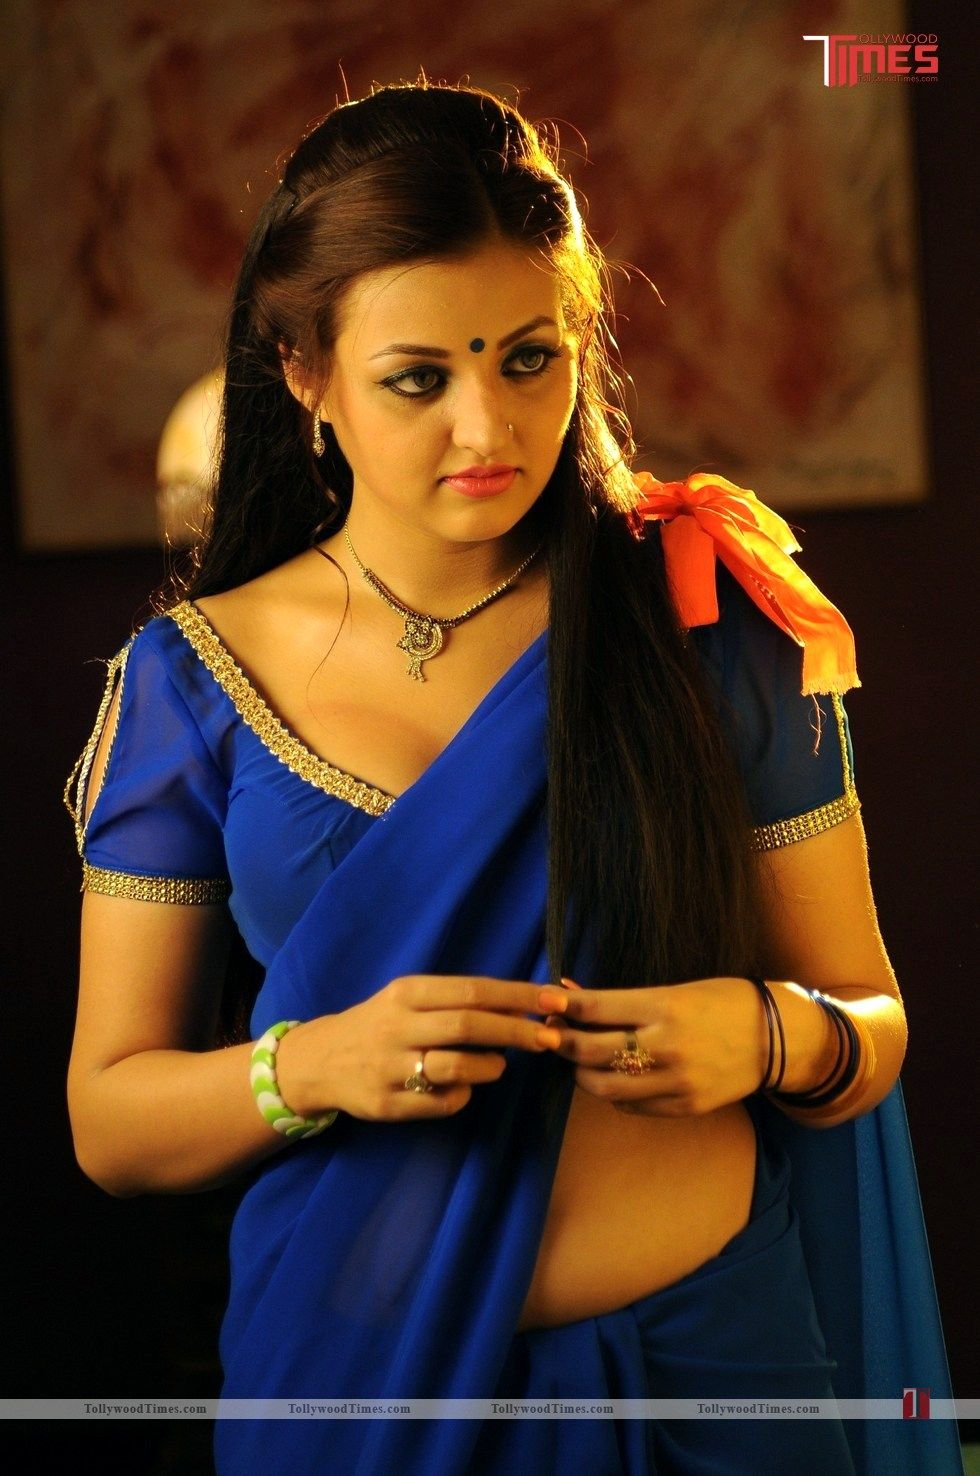 Devdas style marchadu movie New stills:- http://www.tollywoodtimes.com/en/album/fullphoto/5dmn129zk0/91907